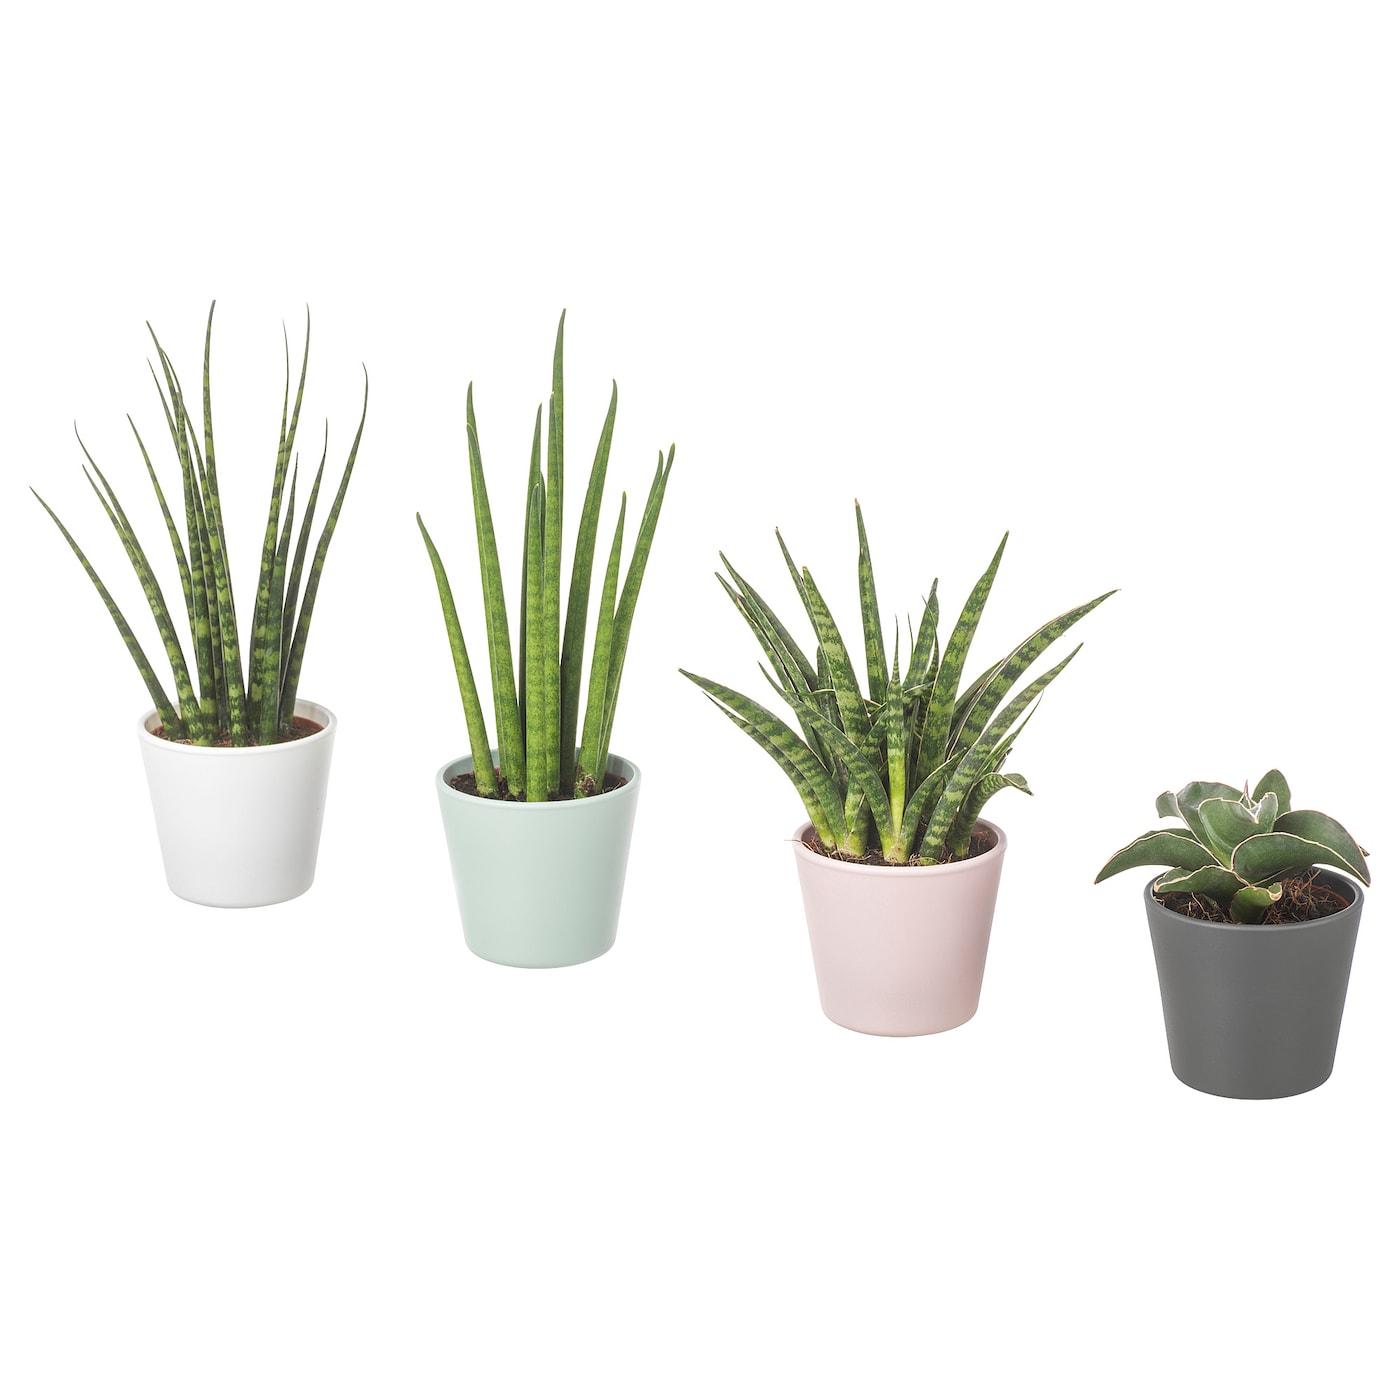 Plantas Naturales | IKEA on